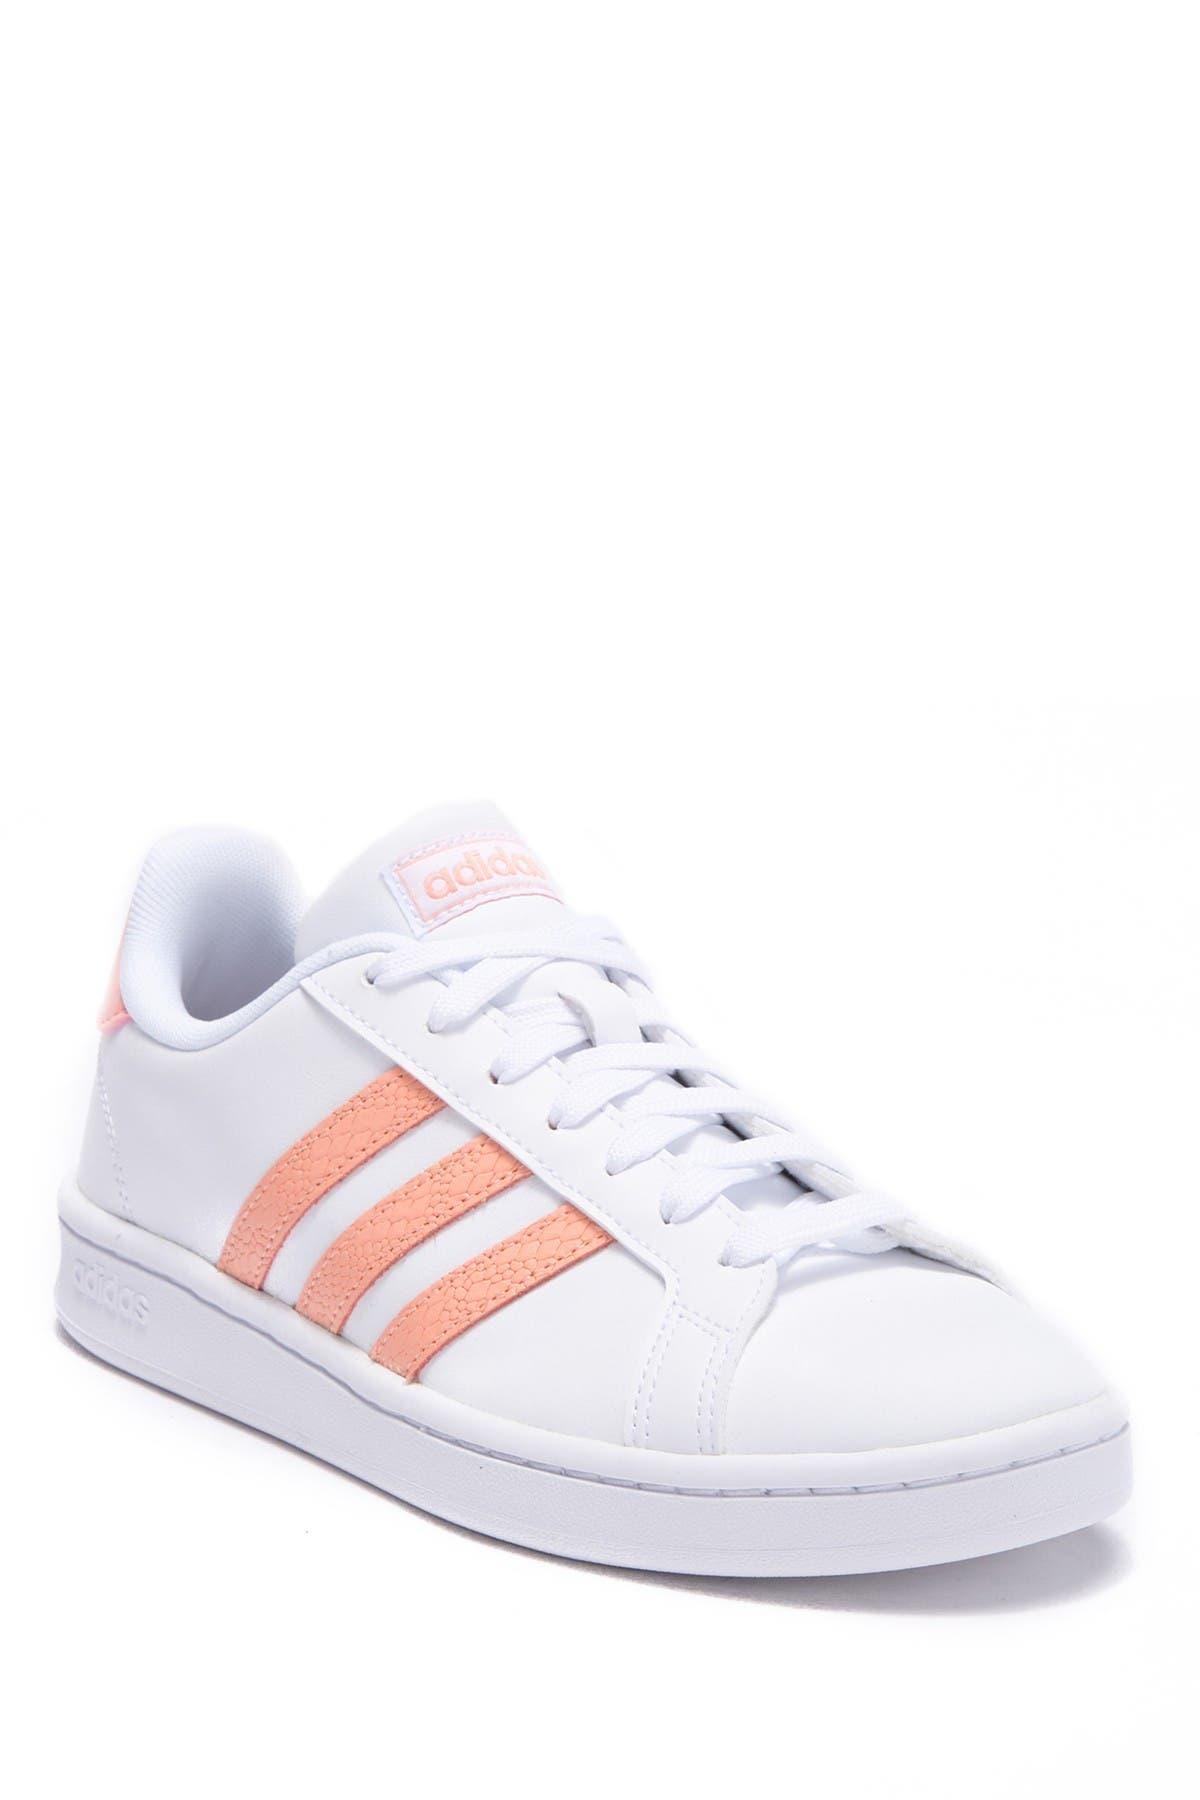 adidas | Grand Court Sneaker